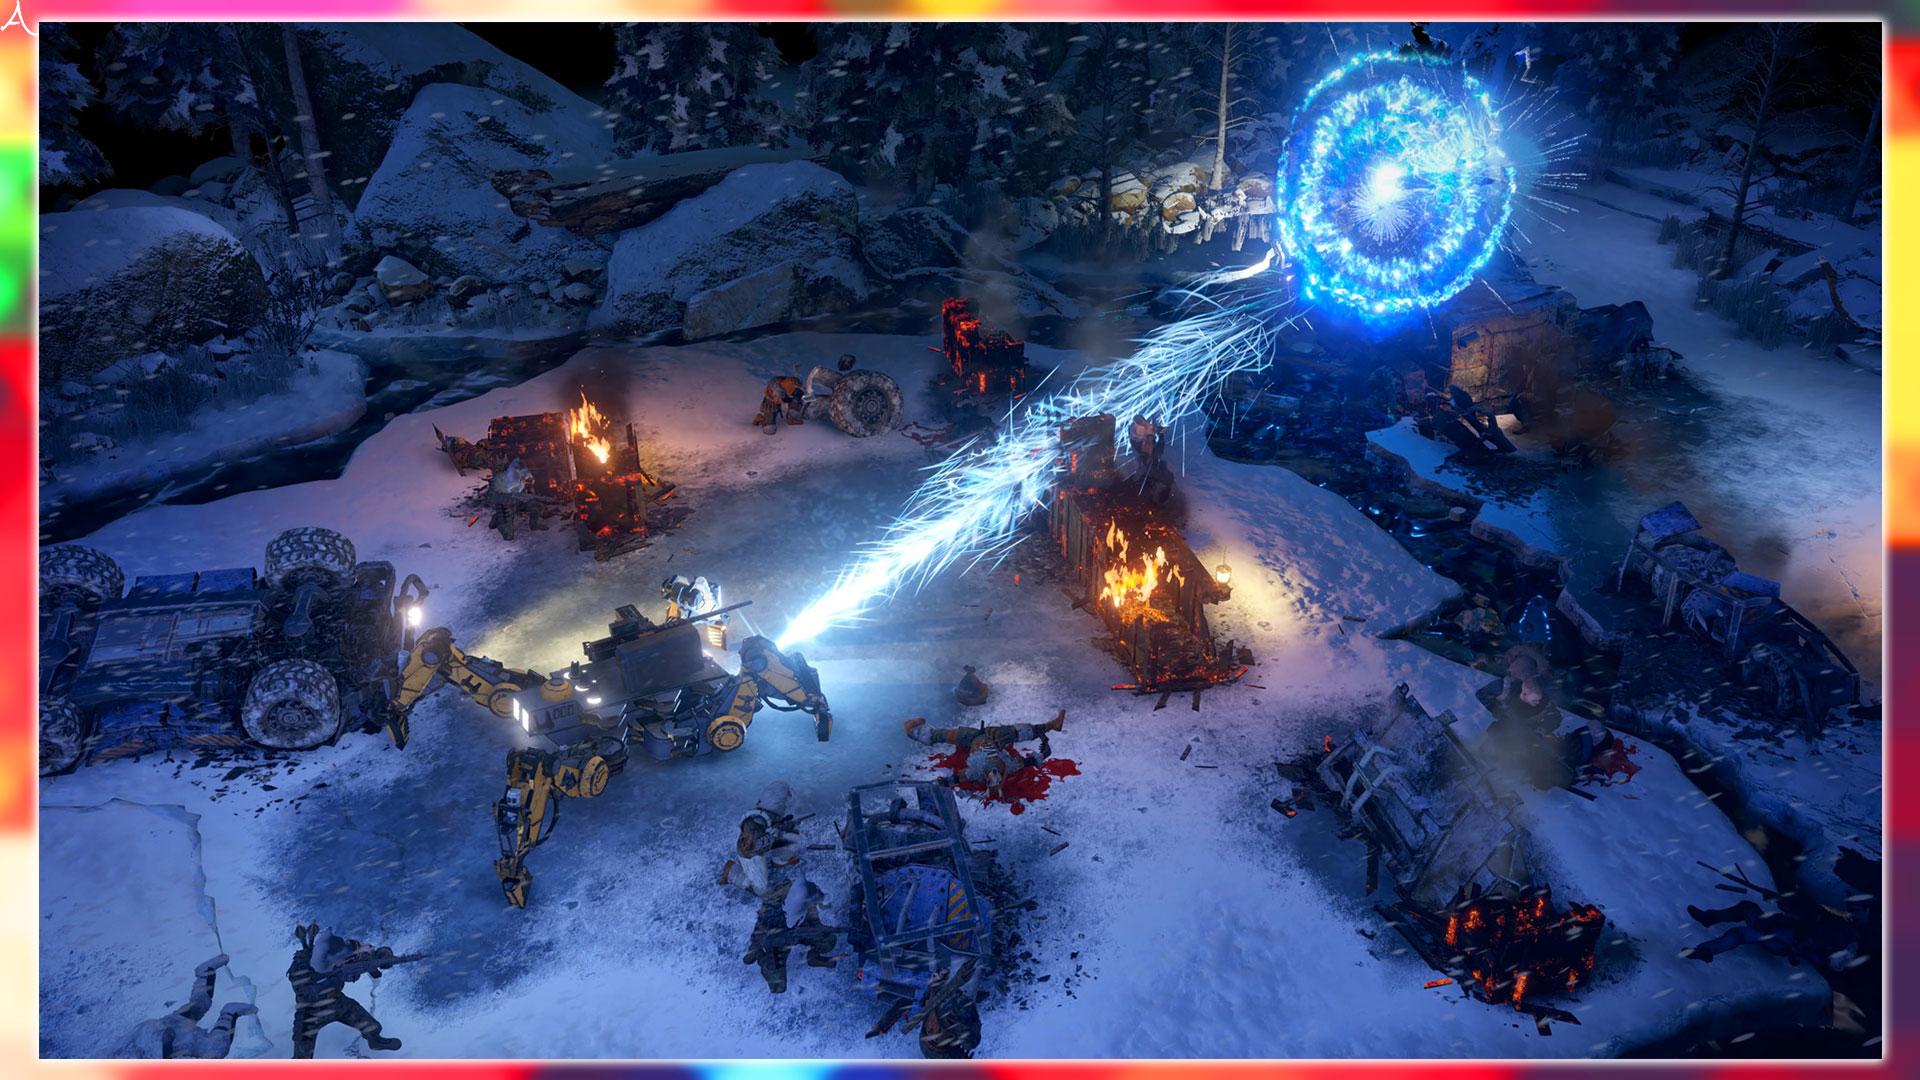 PC版「Wasteland 3」に必要な最低/推奨スペックを確認:快適プレイに必要な値段はどれくらい?